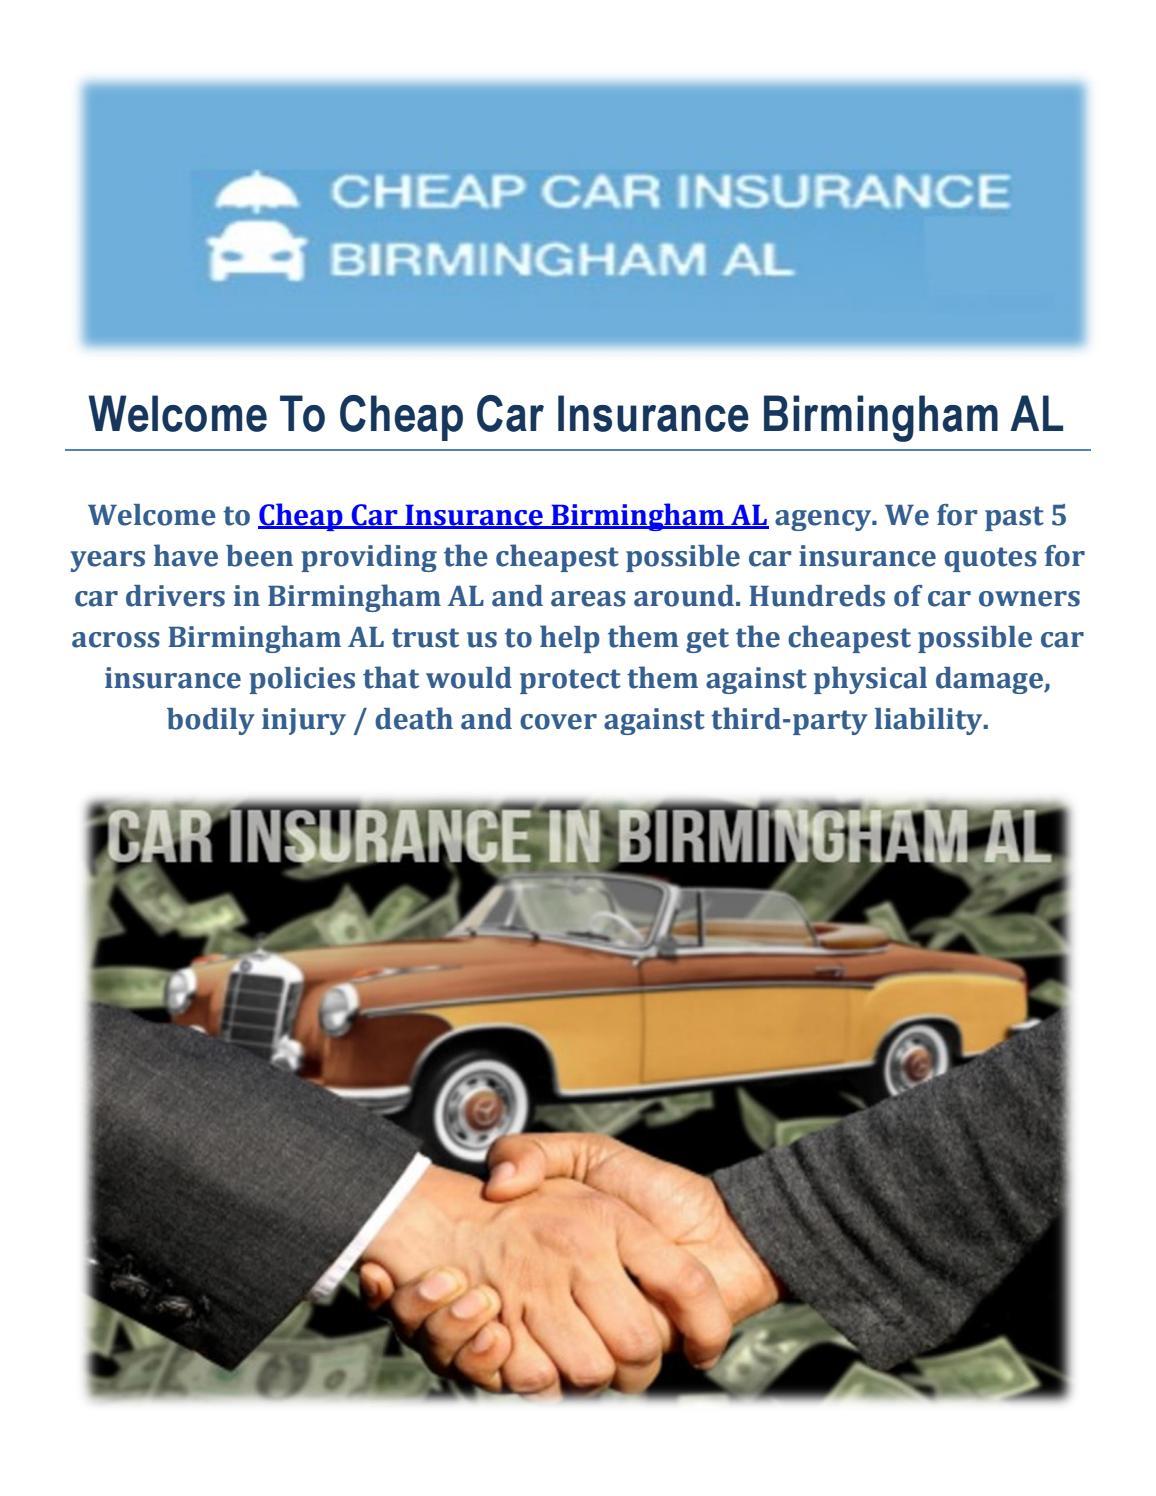 Affordable Car Insurance >> Affordable Car Insurance In Birmingham By Cheap Car